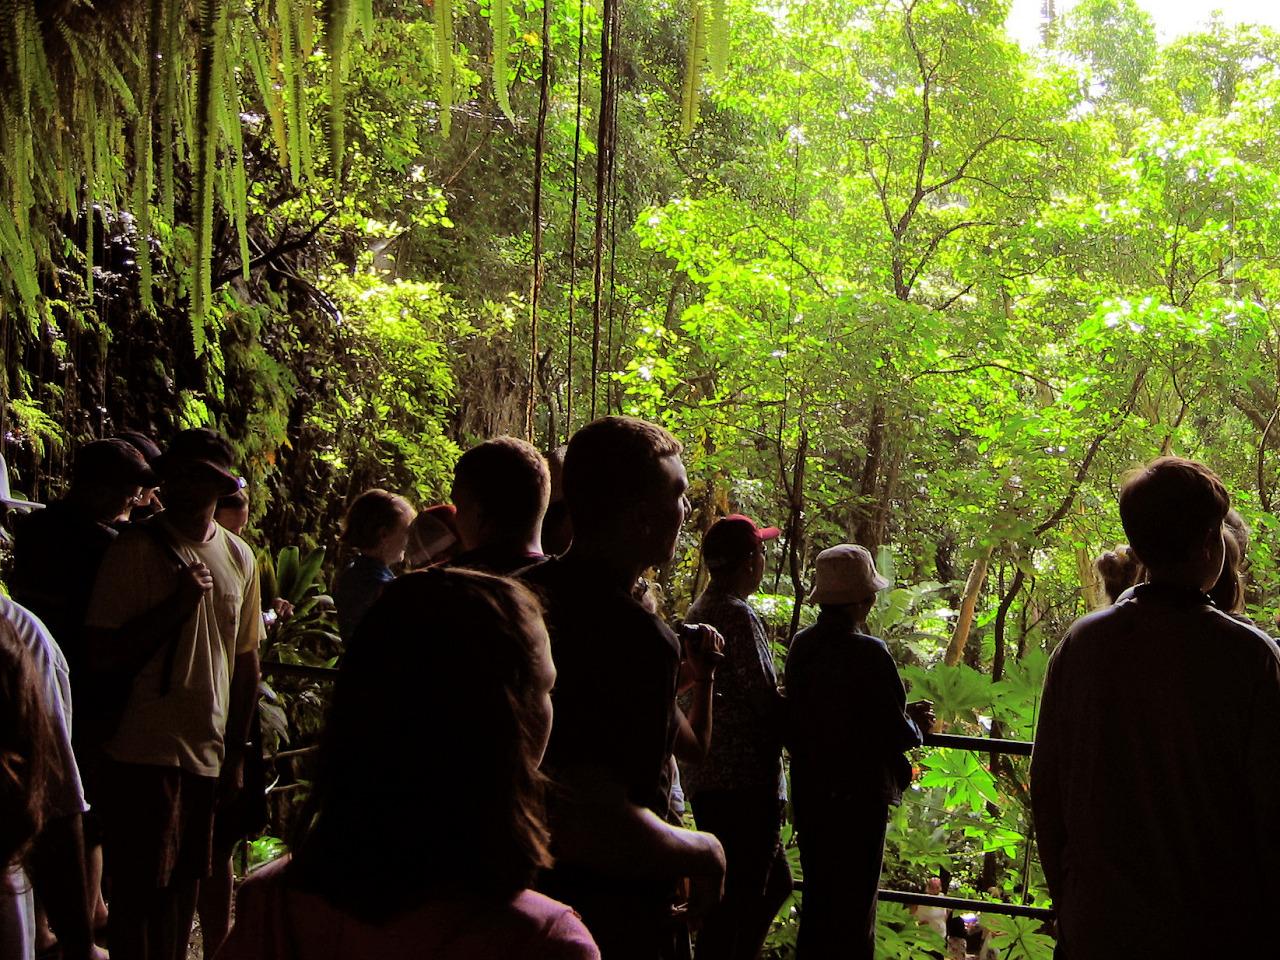 The fern grotto of Wailua in Kauai, Hawaii